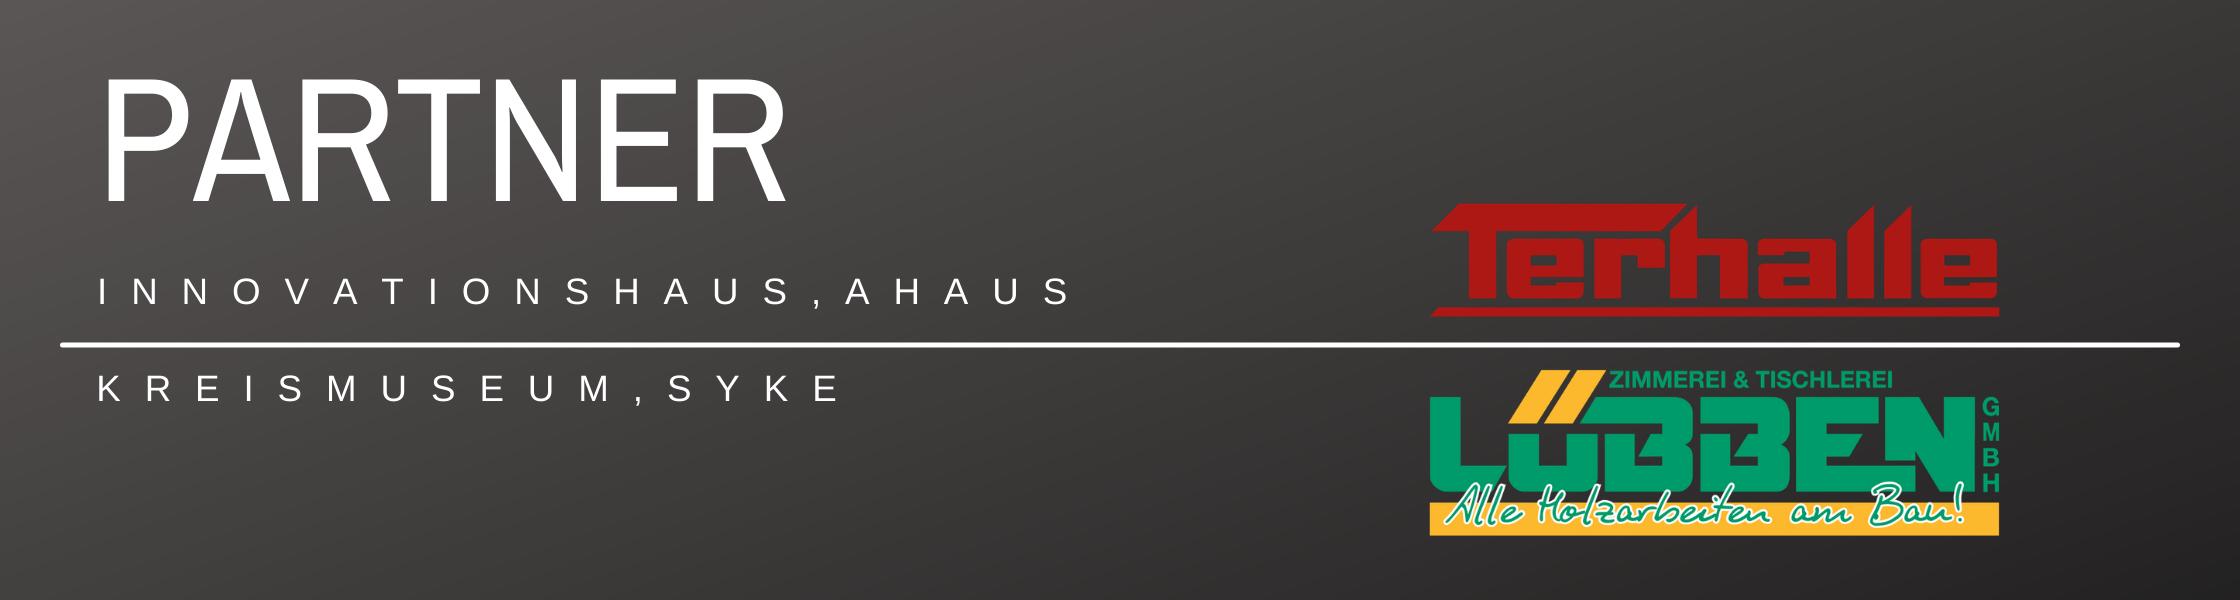 Partner Innovationshaus_Kreismuseum